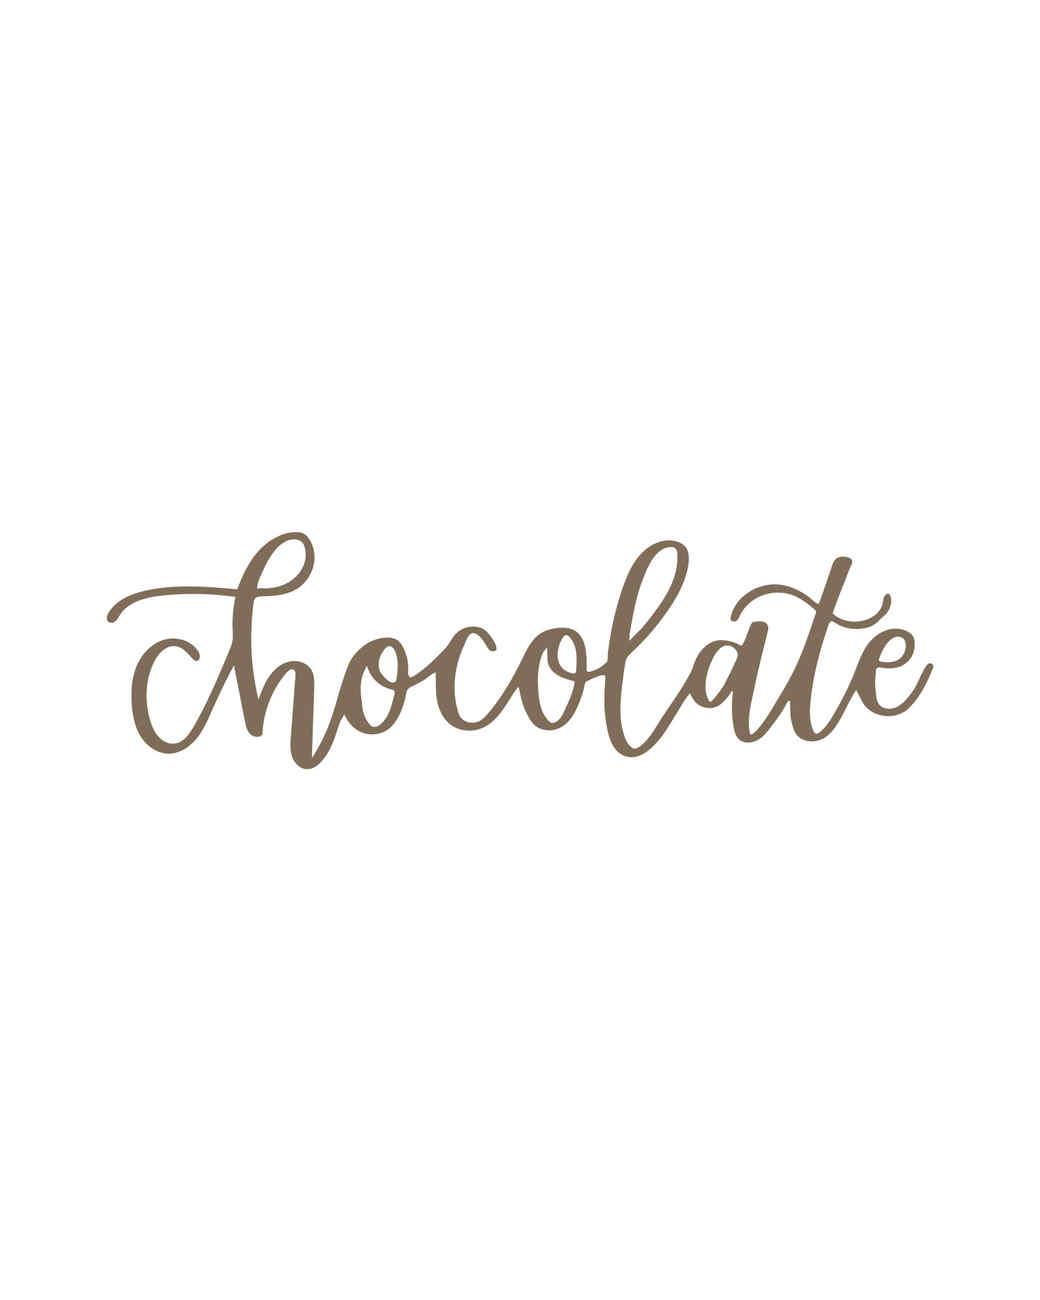 """chocolate"" calligraphy"